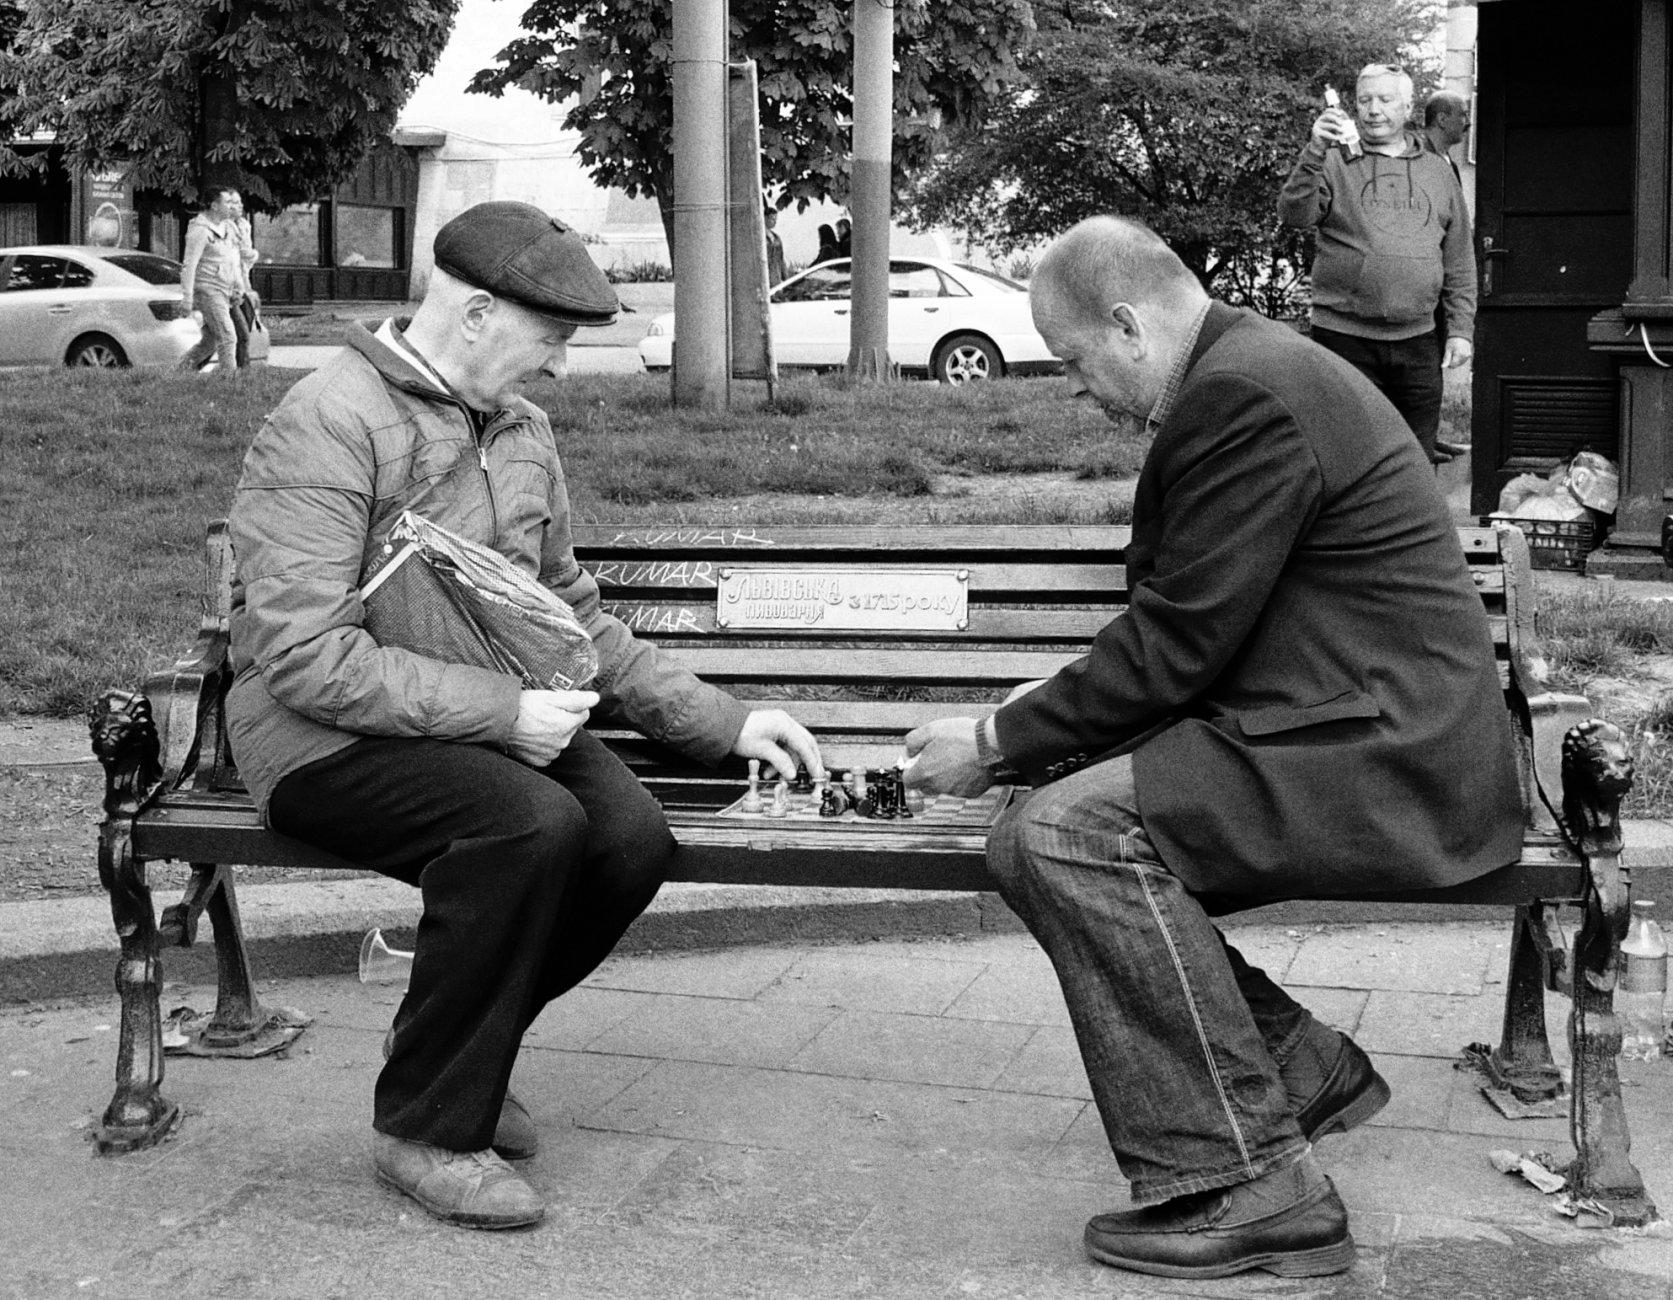 Game of Chess, Lviv Ukraine